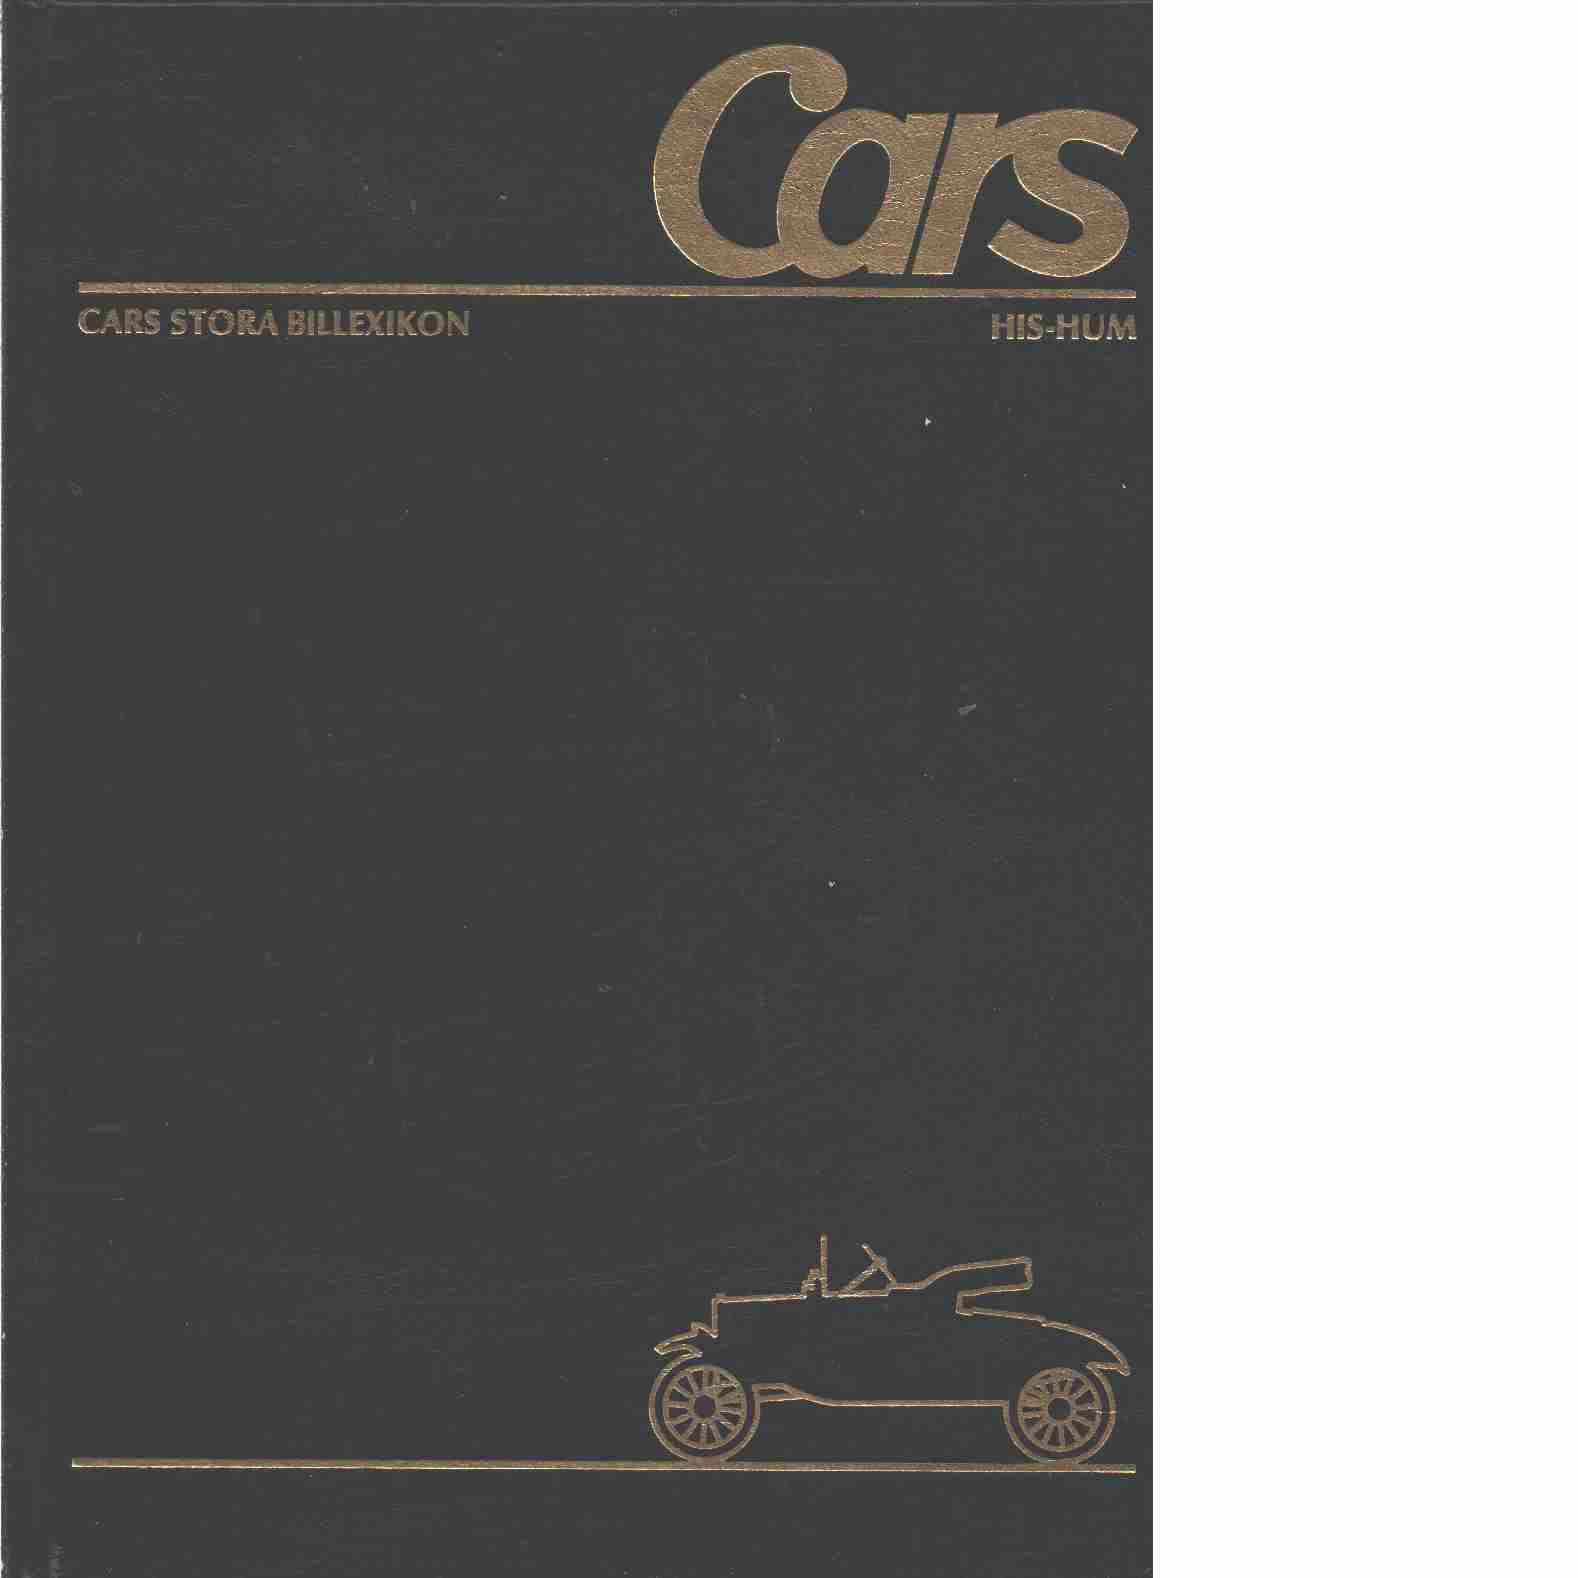 Cars stora billexikon. 16, Hispano-Suiza-Humber - Red.